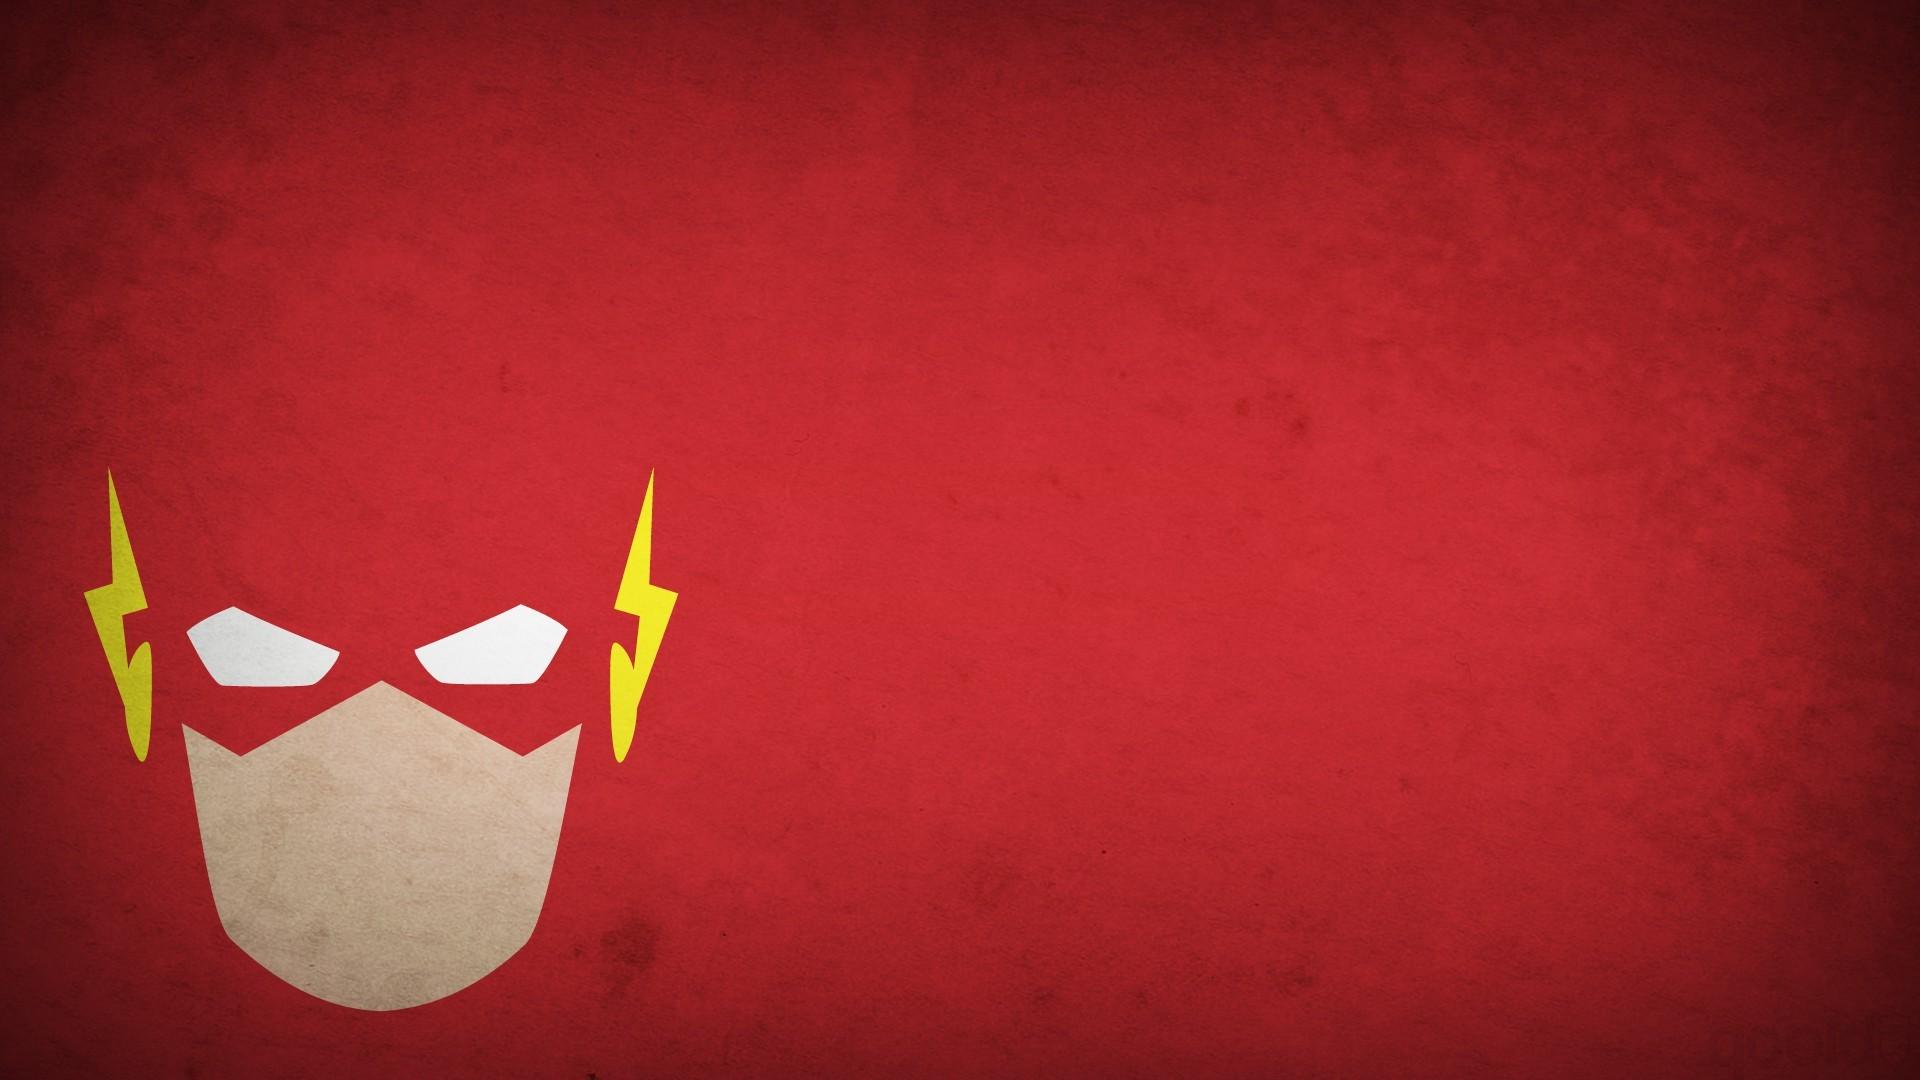 Top Wallpaper Marvel Simple - 1920x1080-px-Blo0p-comics-DC-Comics-Flash-Heroes-Marvel-Cinematic-Universe-Marvel-Heroes-minimalism-red-background-simple-background-superhero-The-Flash-738932  Graphic_22960.jpg